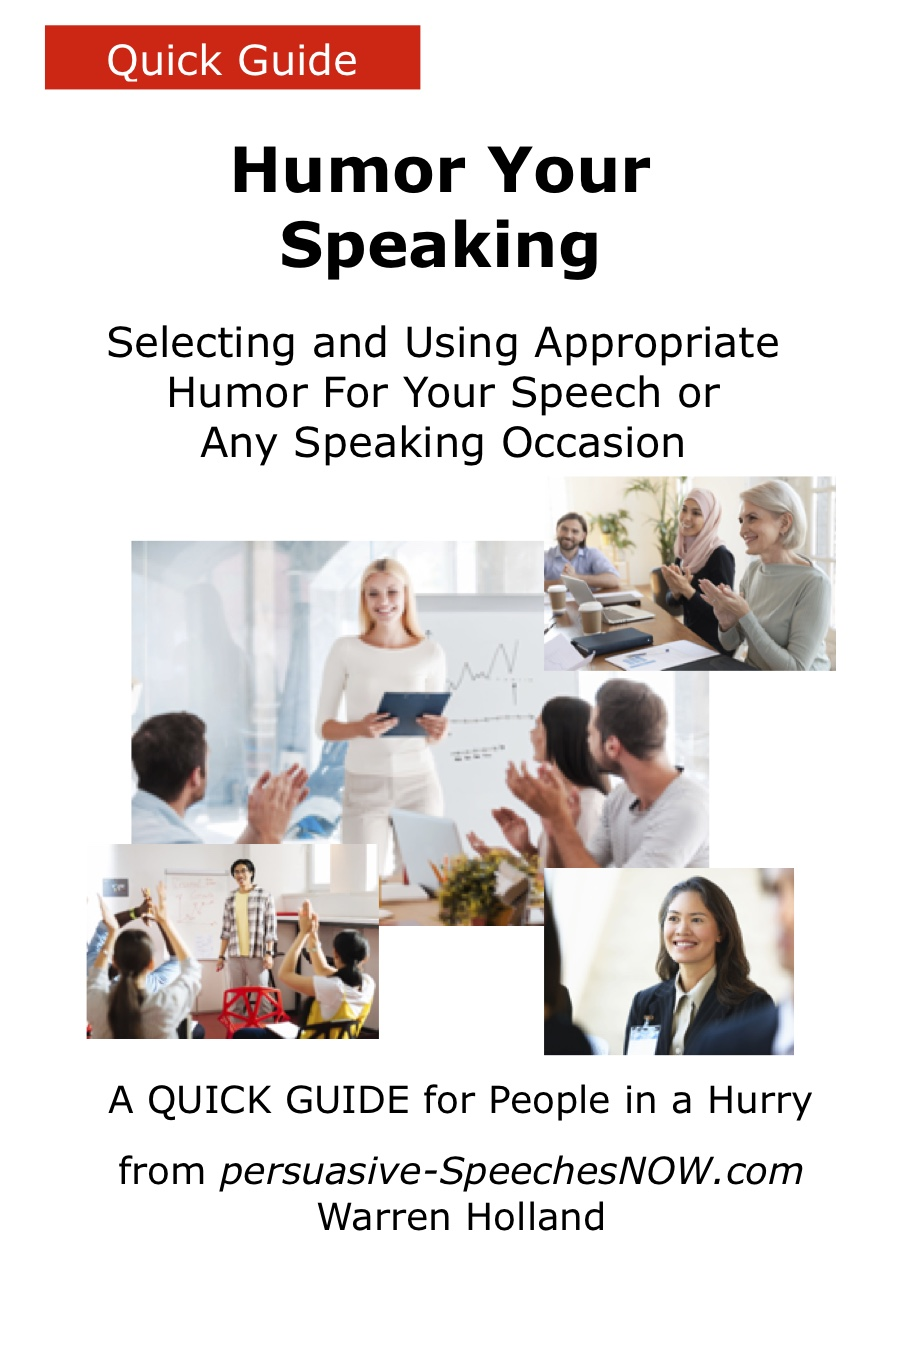 Humor Your Speaking at persuasive-SpeechesNow.com